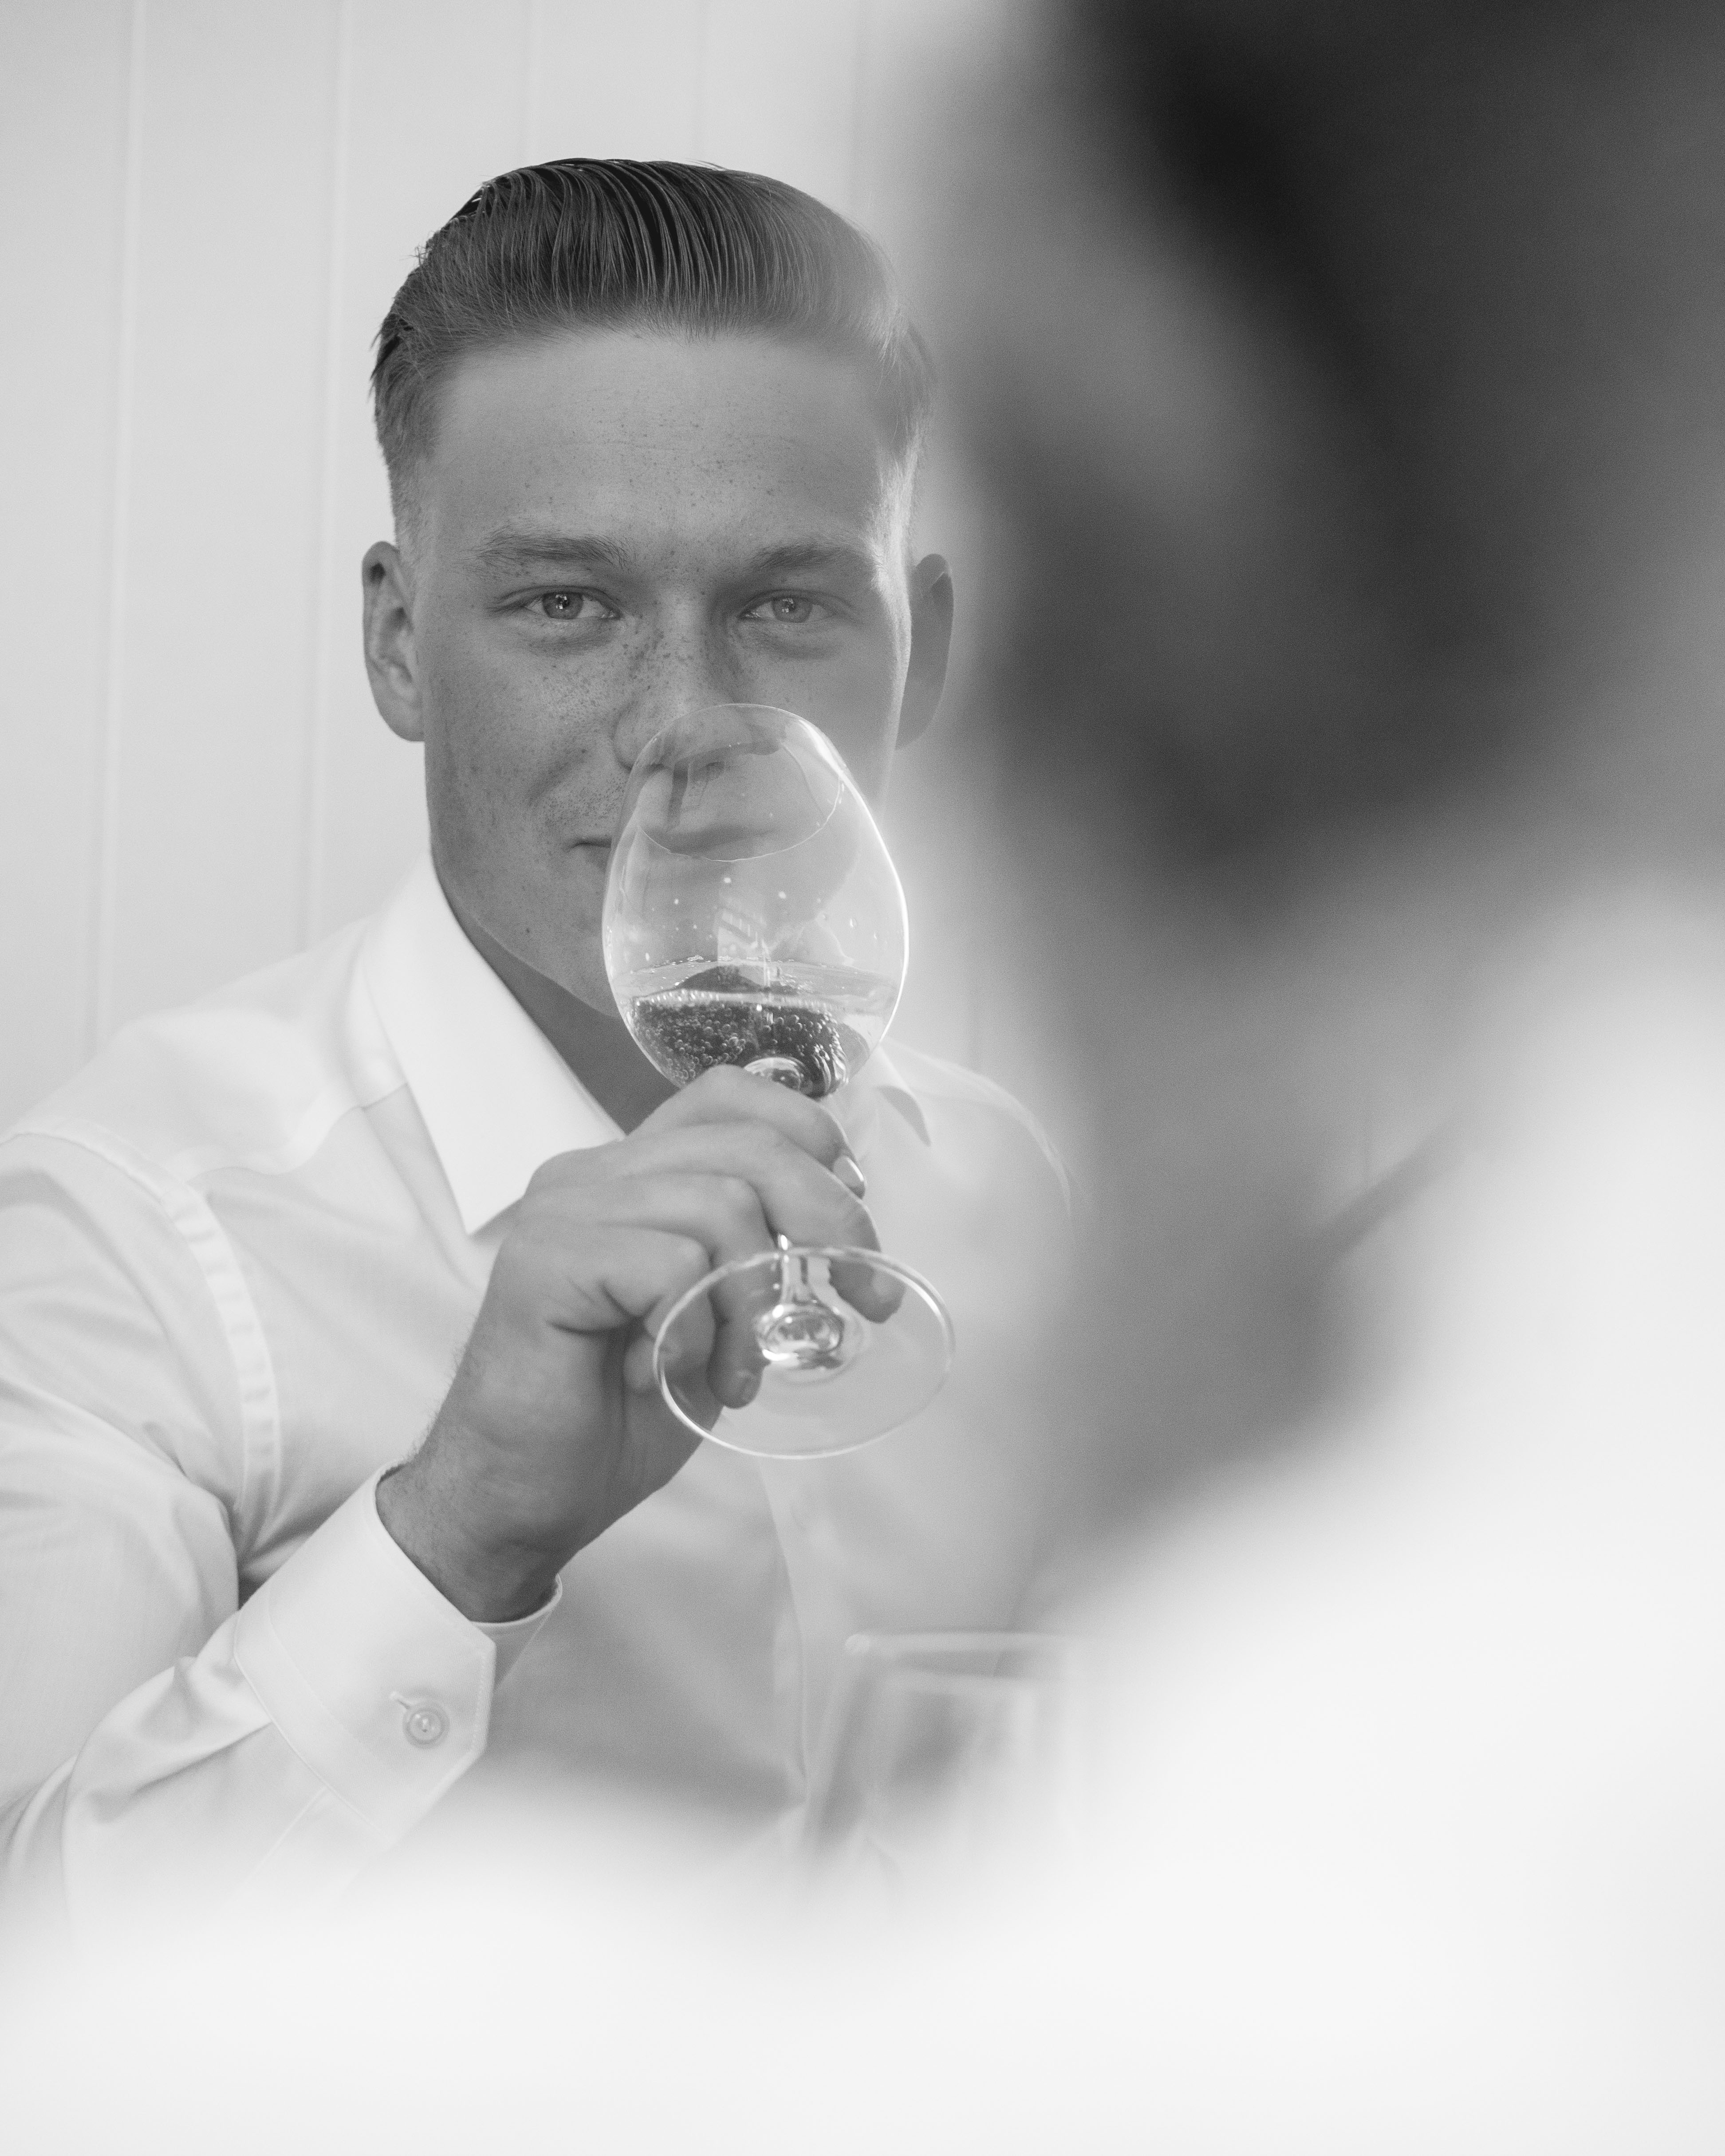 17. Mai 2019 - Man drinking wine